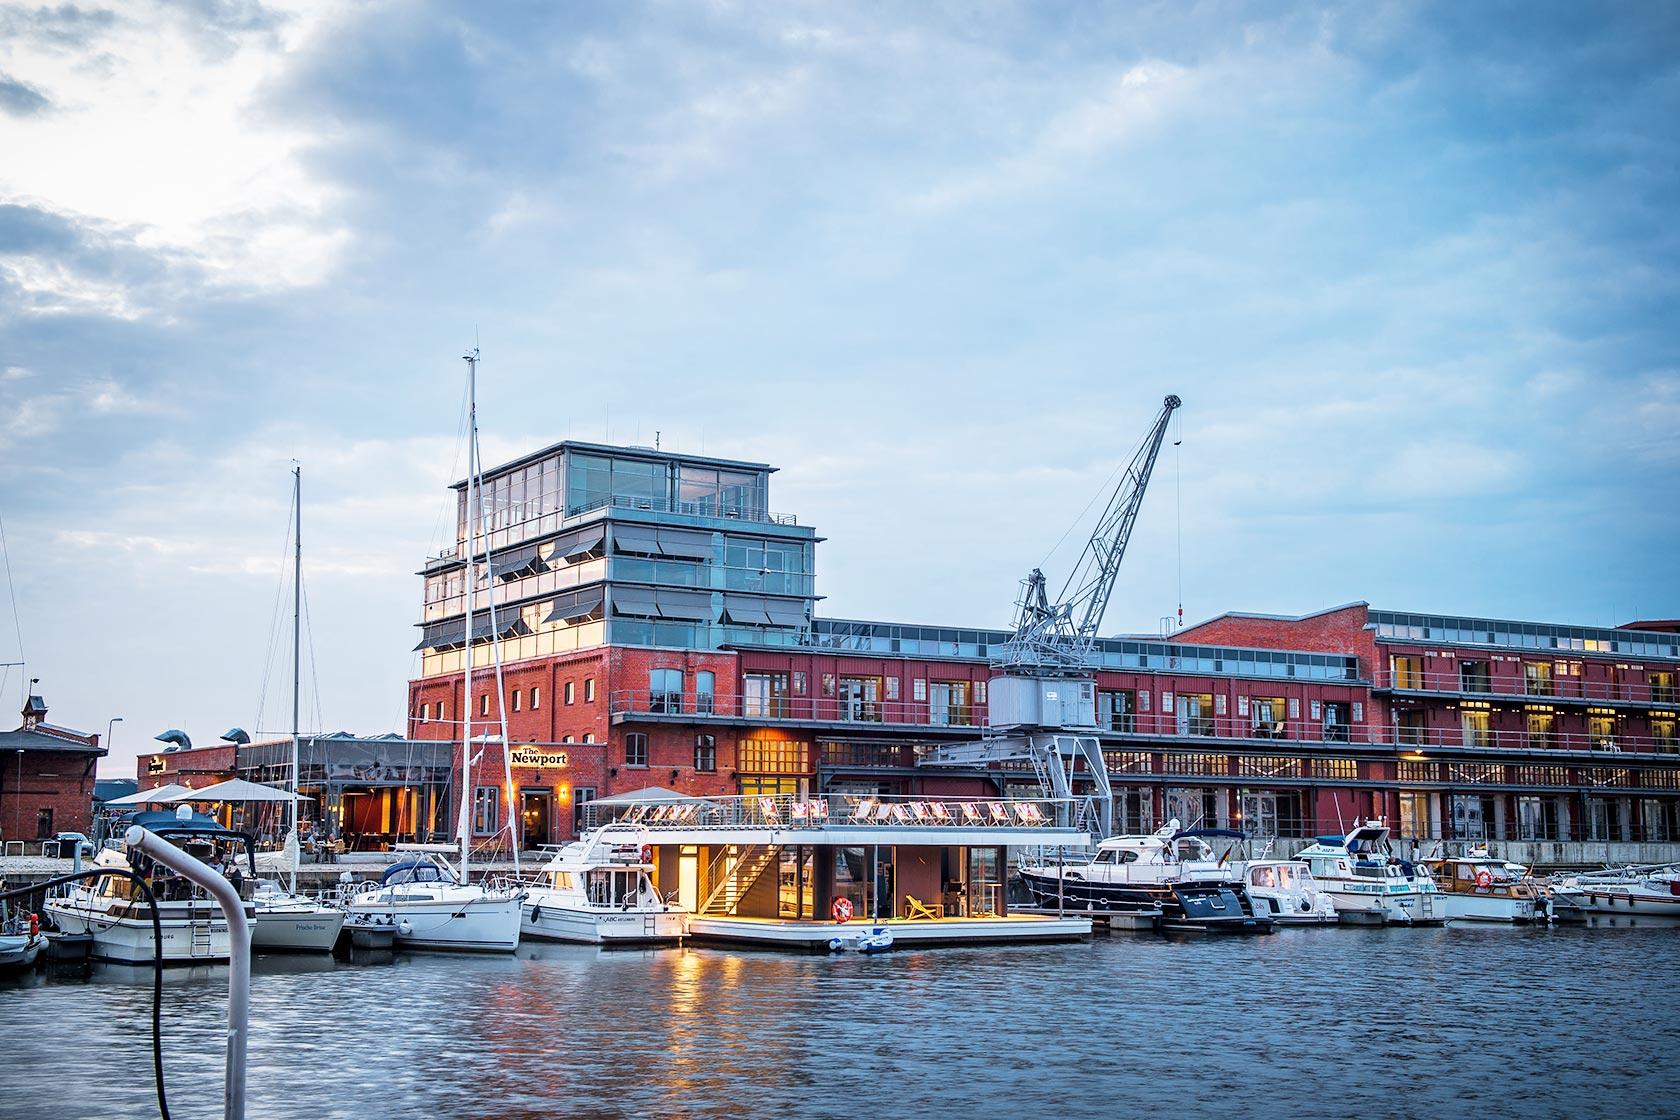 Restaurant & Marina